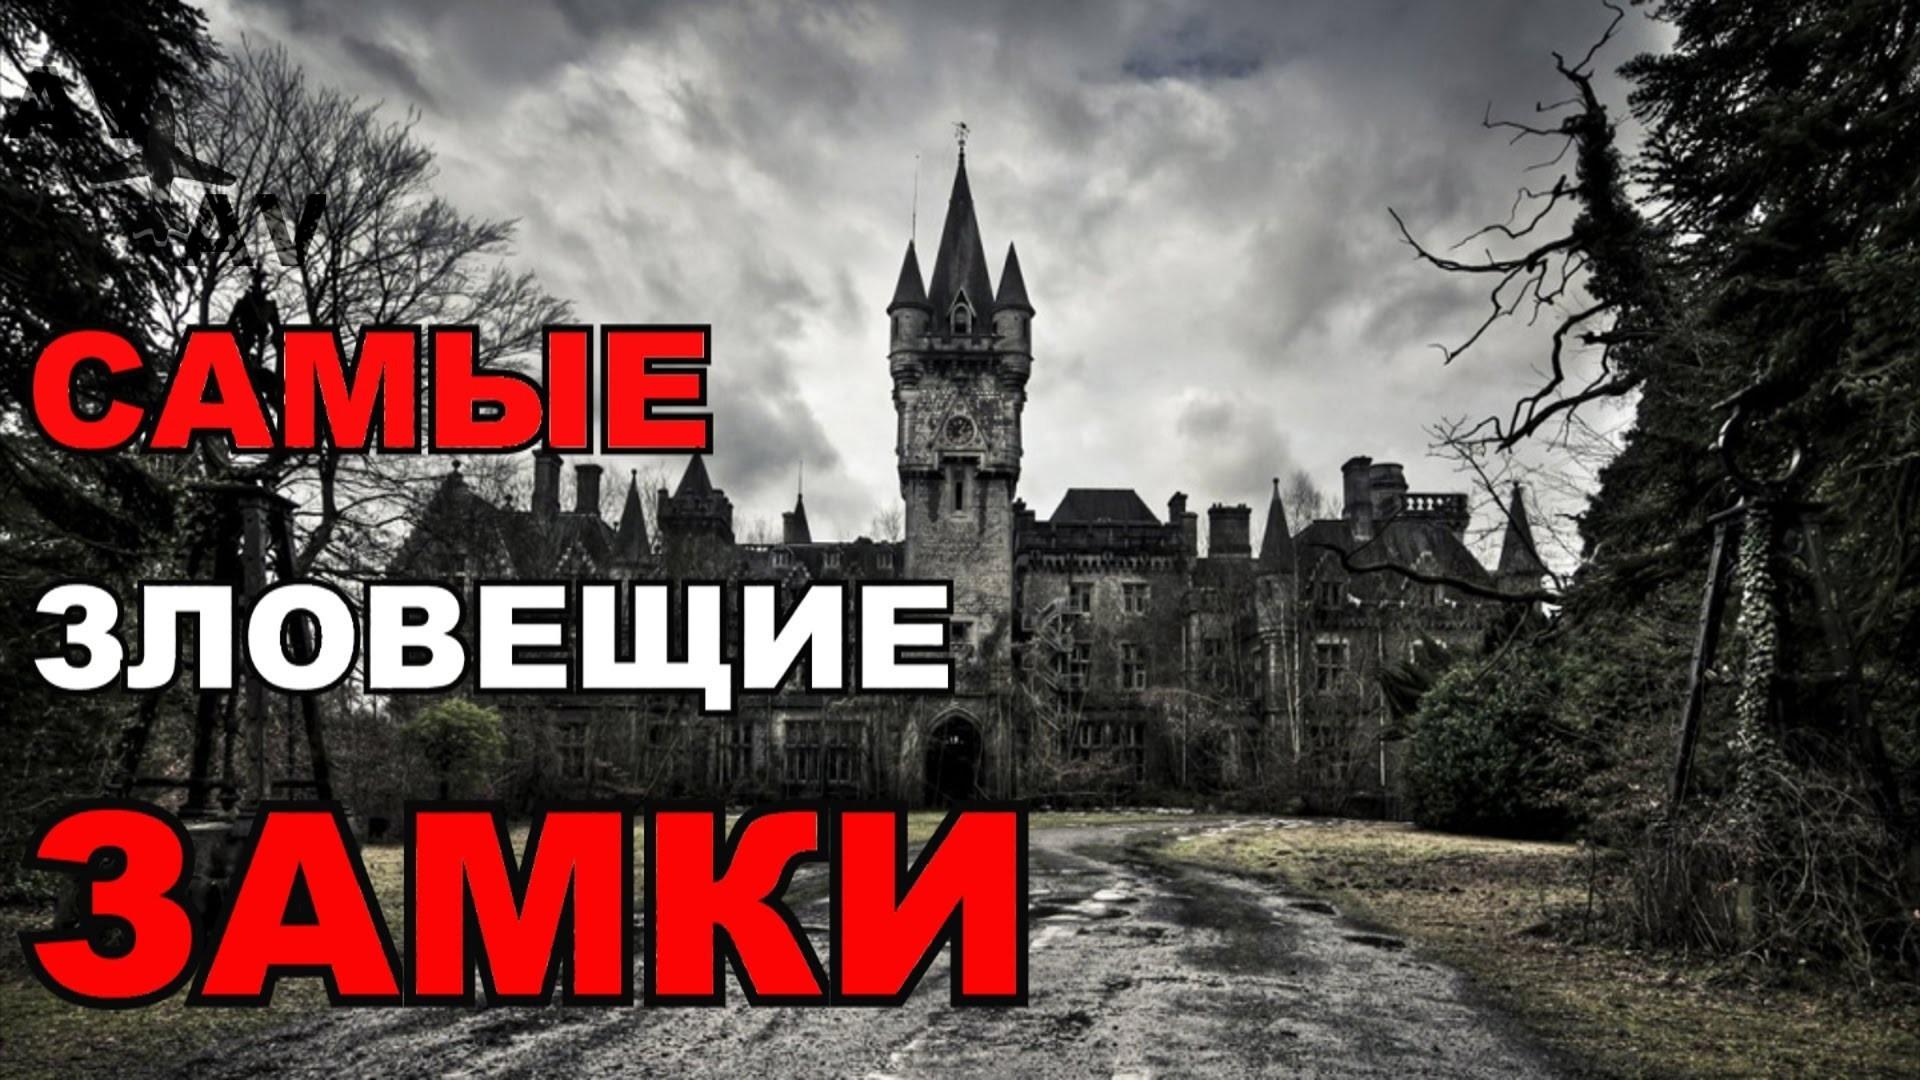 Samyie zagadochnyie zamki mira - Самые загадочные замки мира